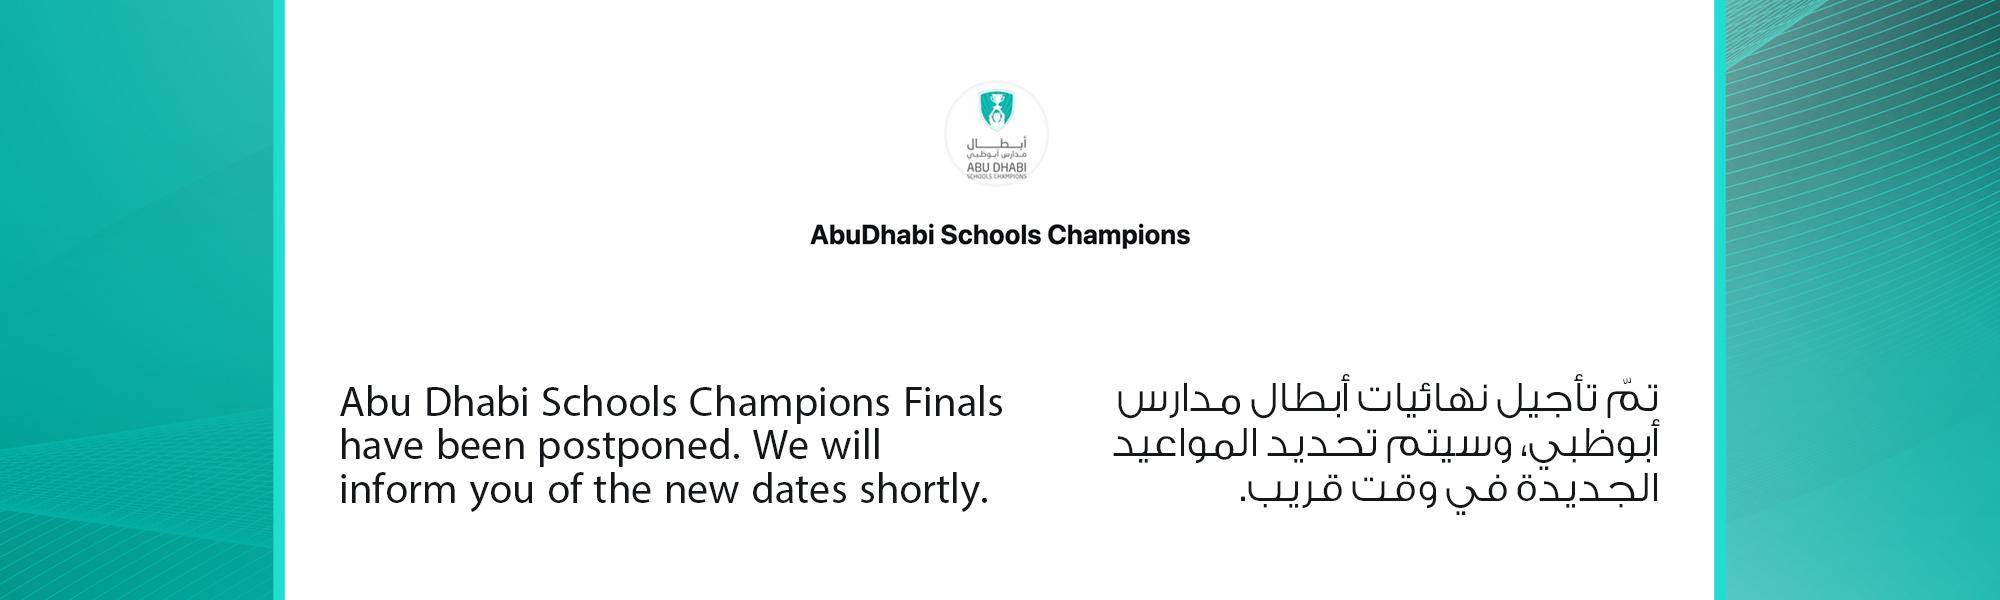 Abu Dhabi School Champions